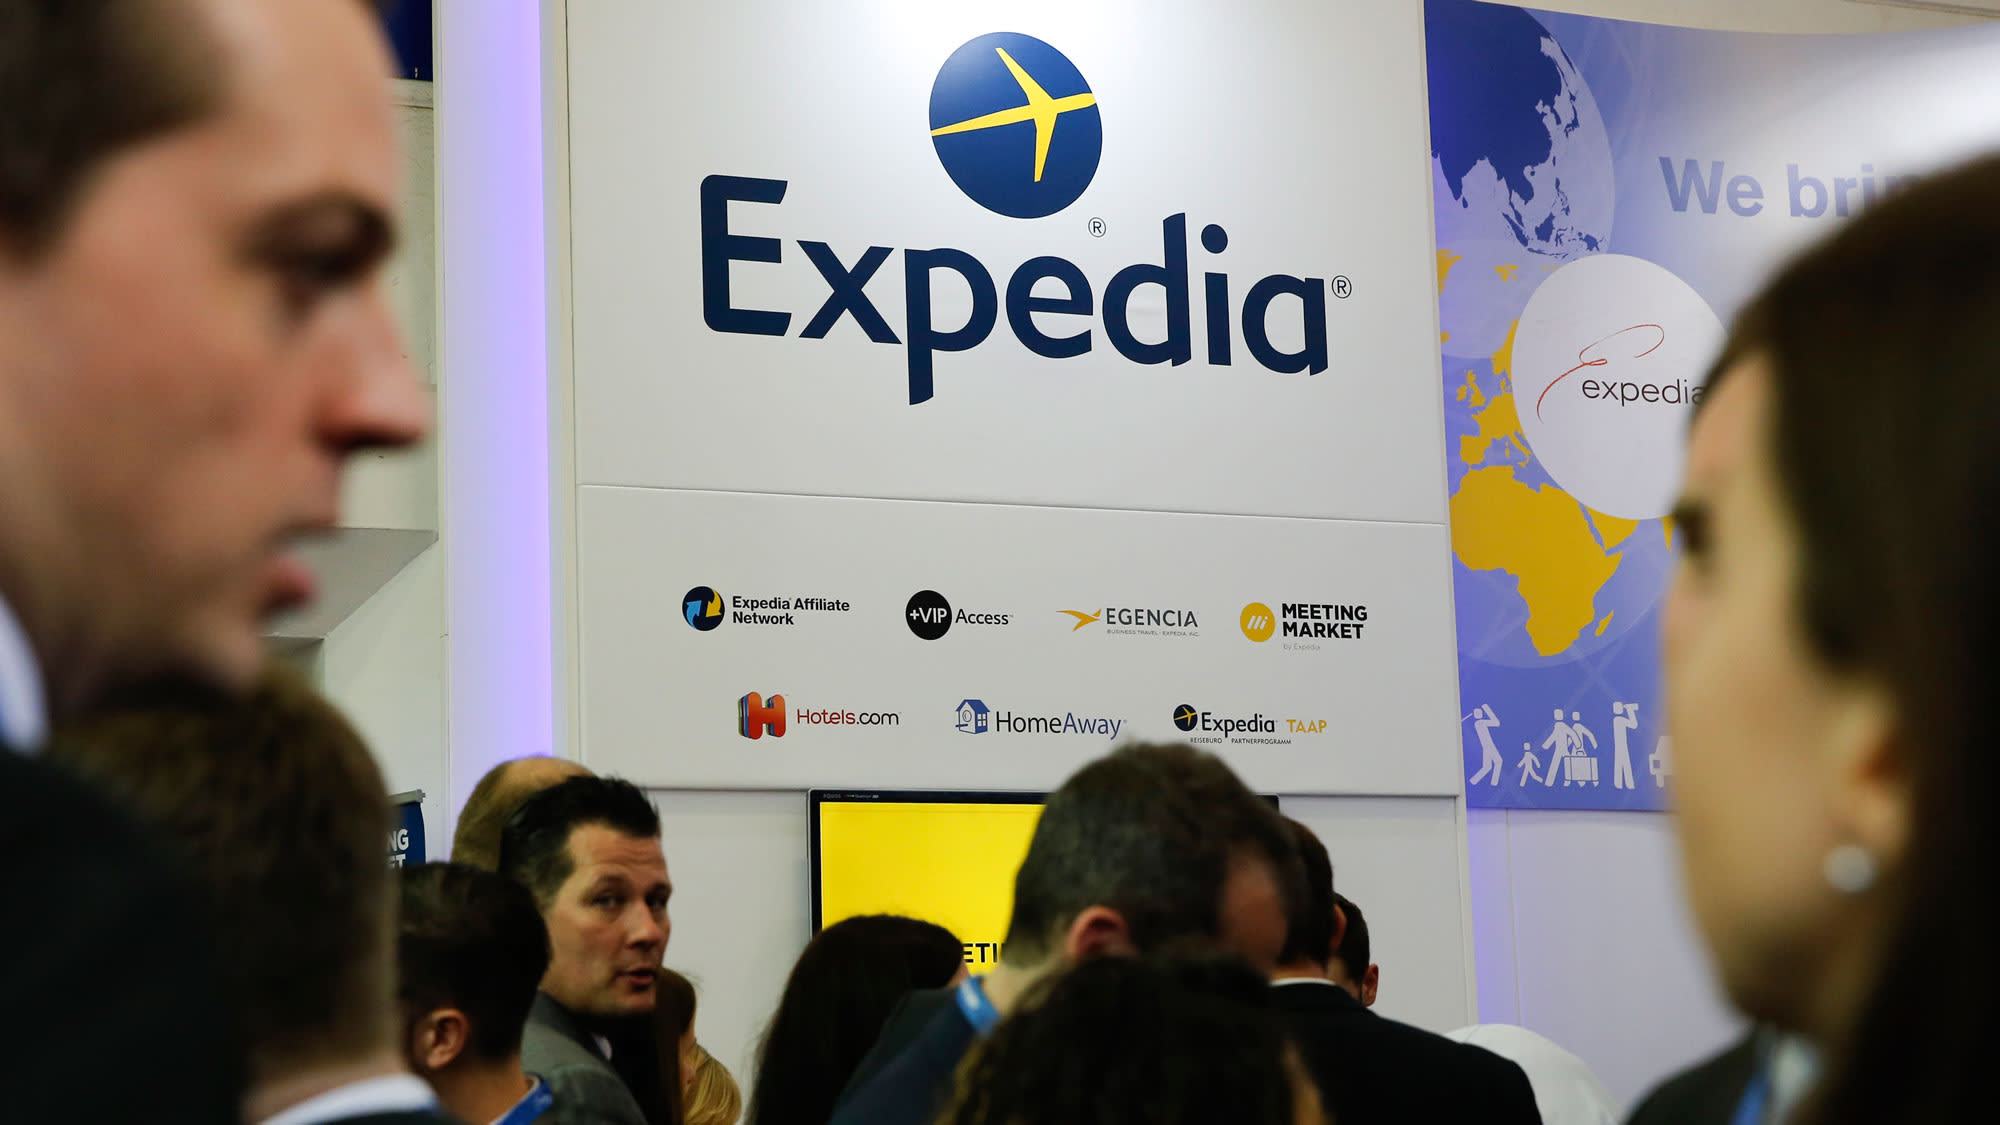 Expedia (EXPE) Q1 2020 earnings